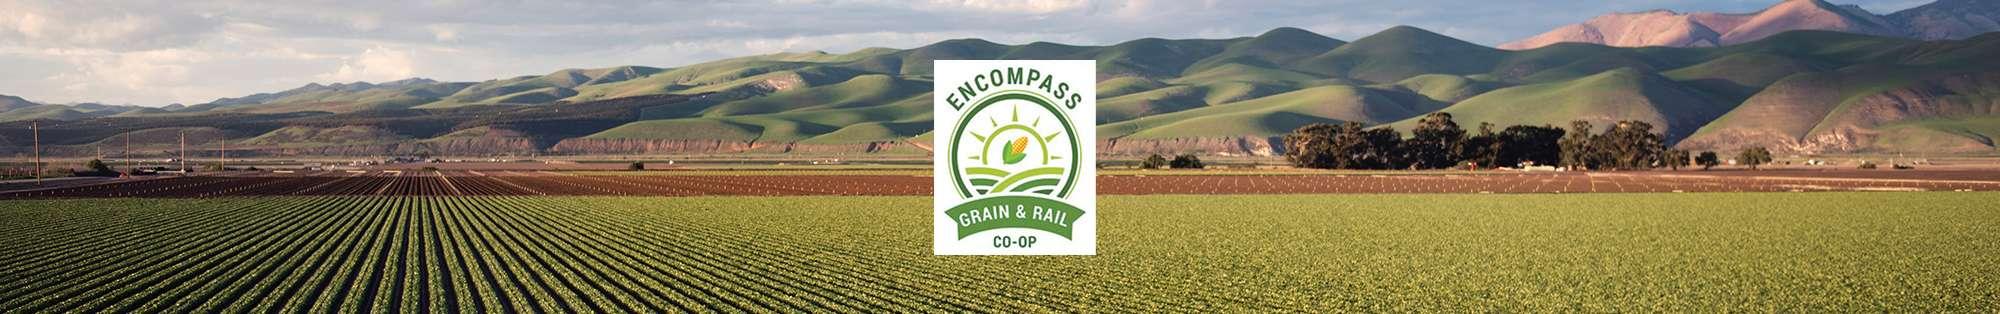 Encompass Grain & Rail Co-Op